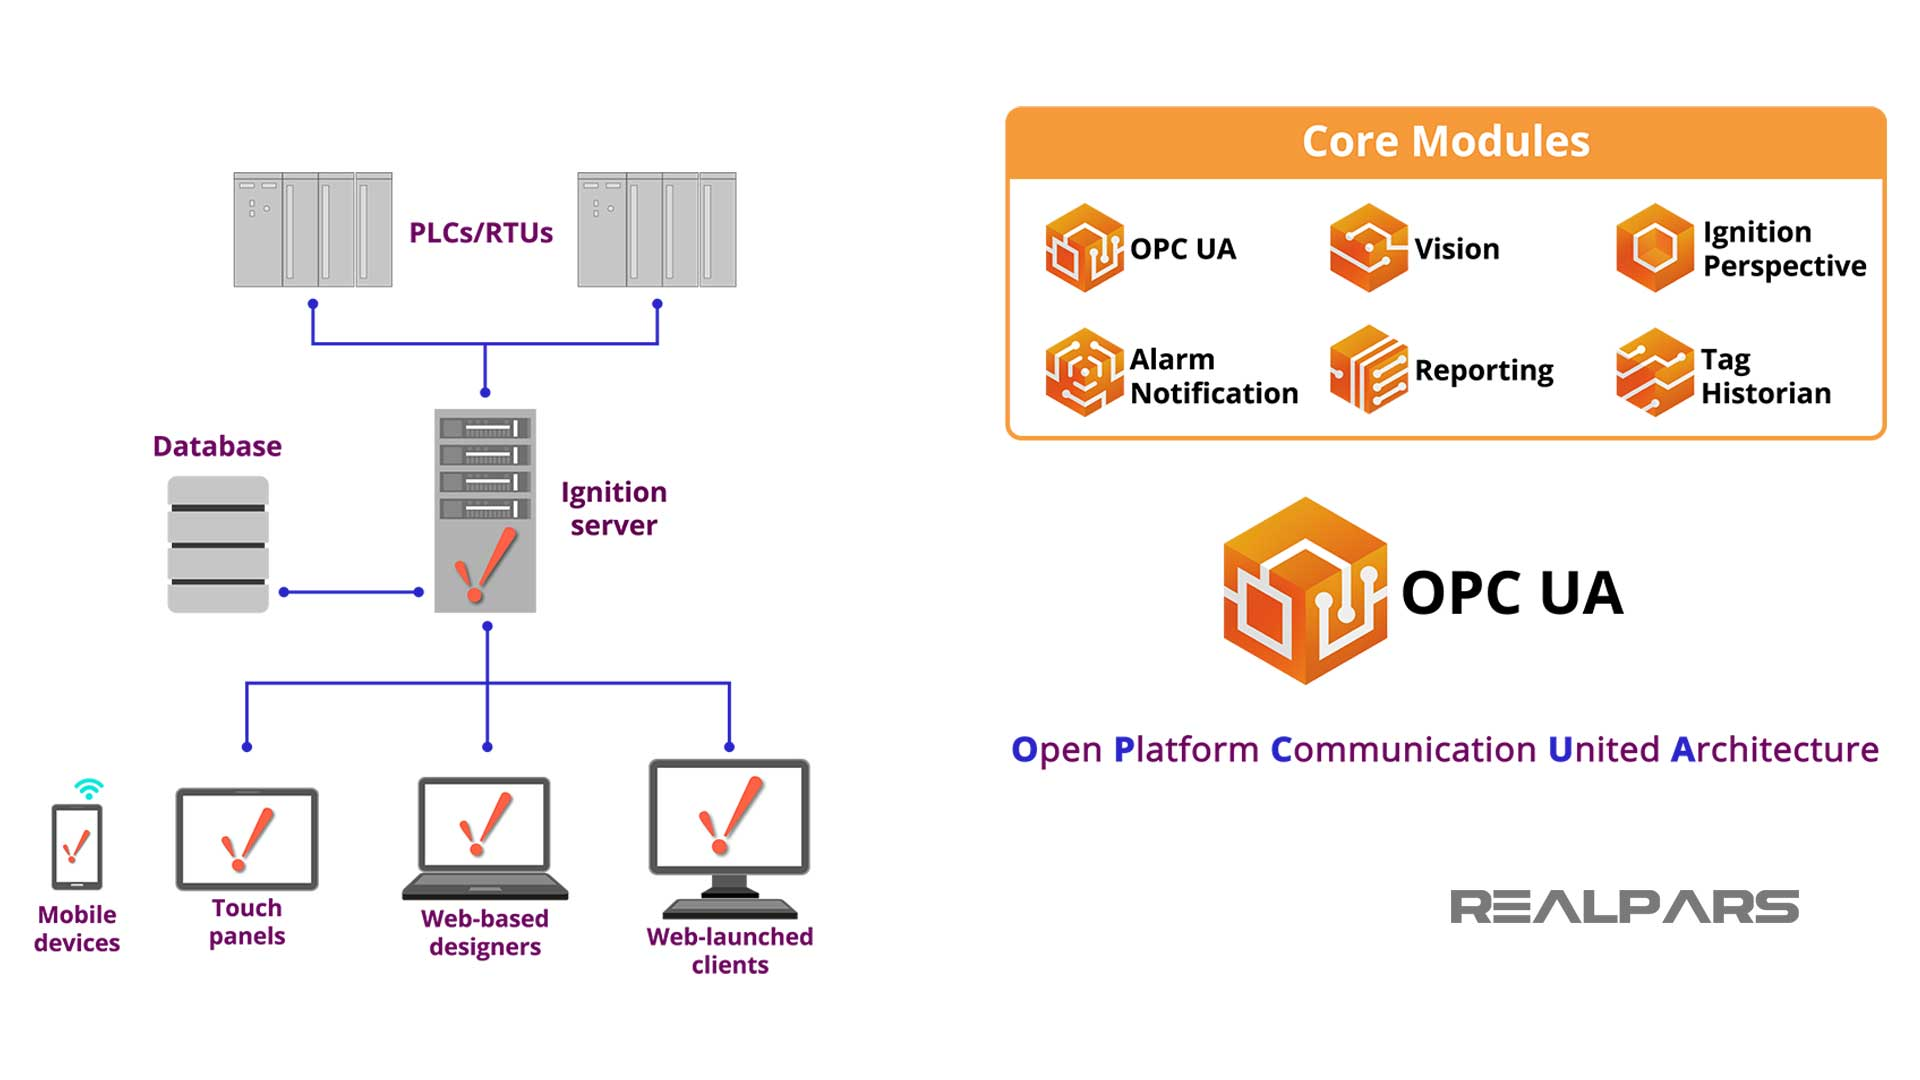 Ignition's-core-modules---OPC-UA-Server-module